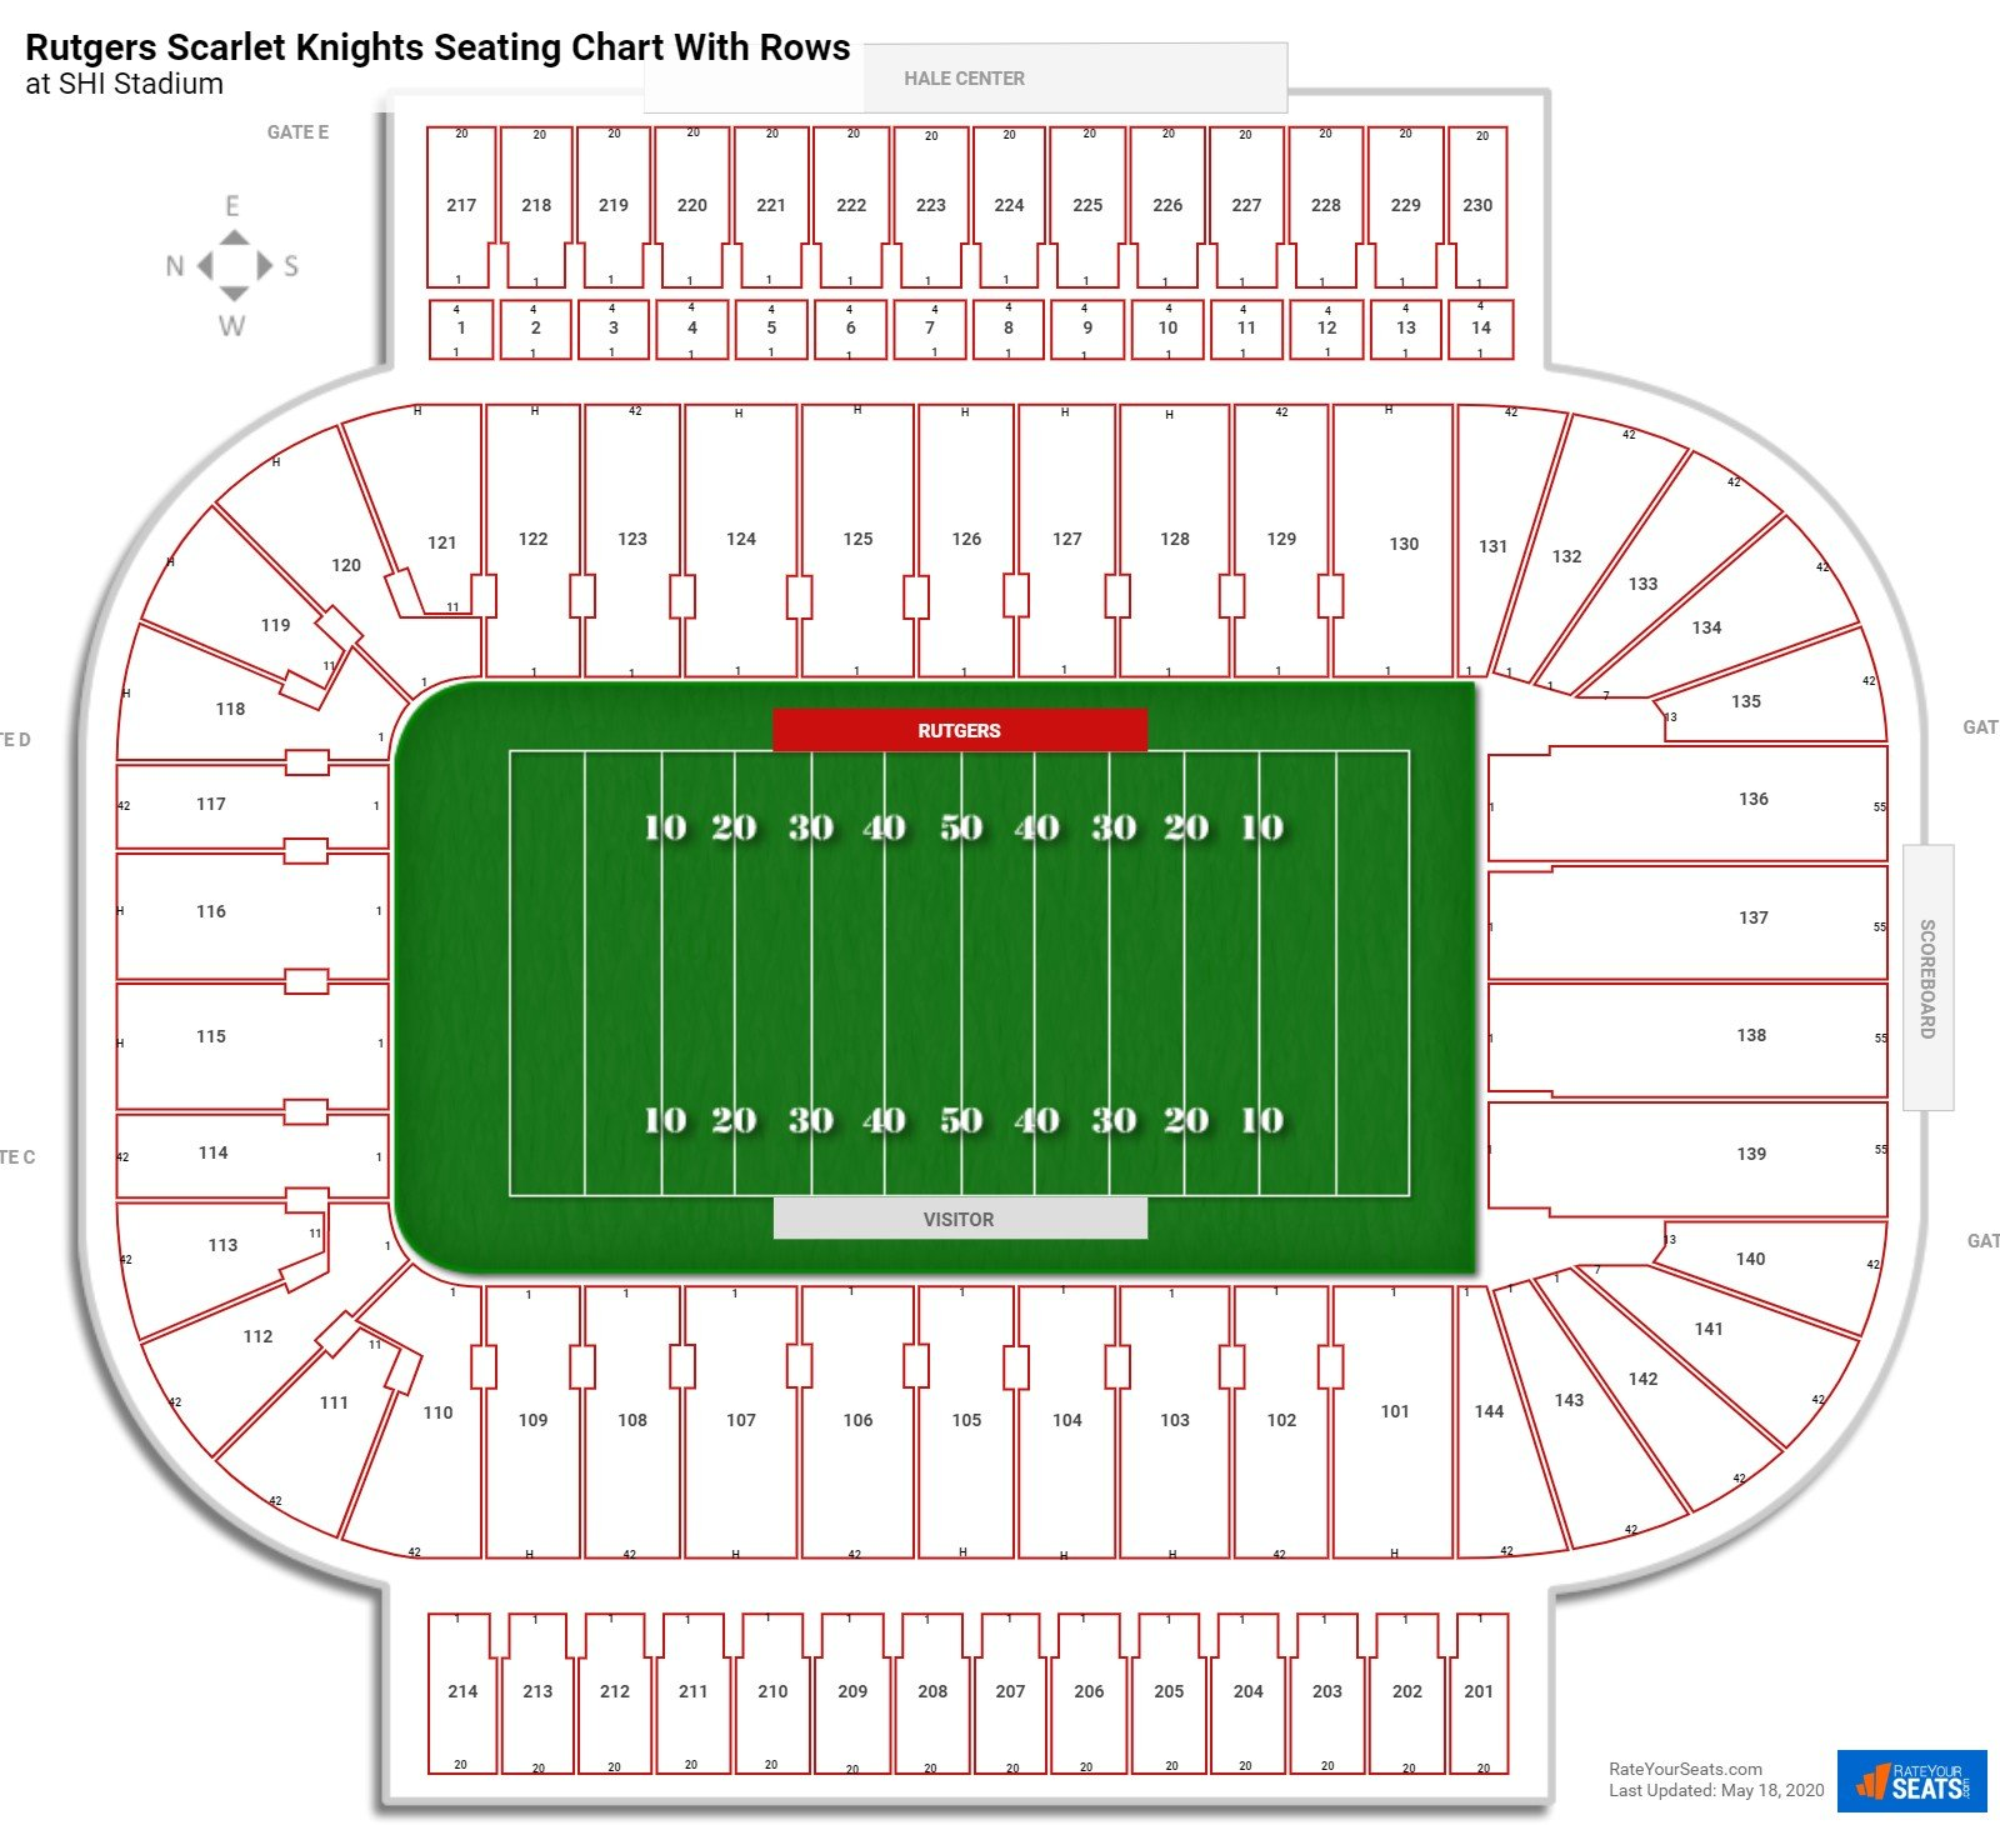 SHI Stadium Seating for Rutgers Football - RateYourSeats.com